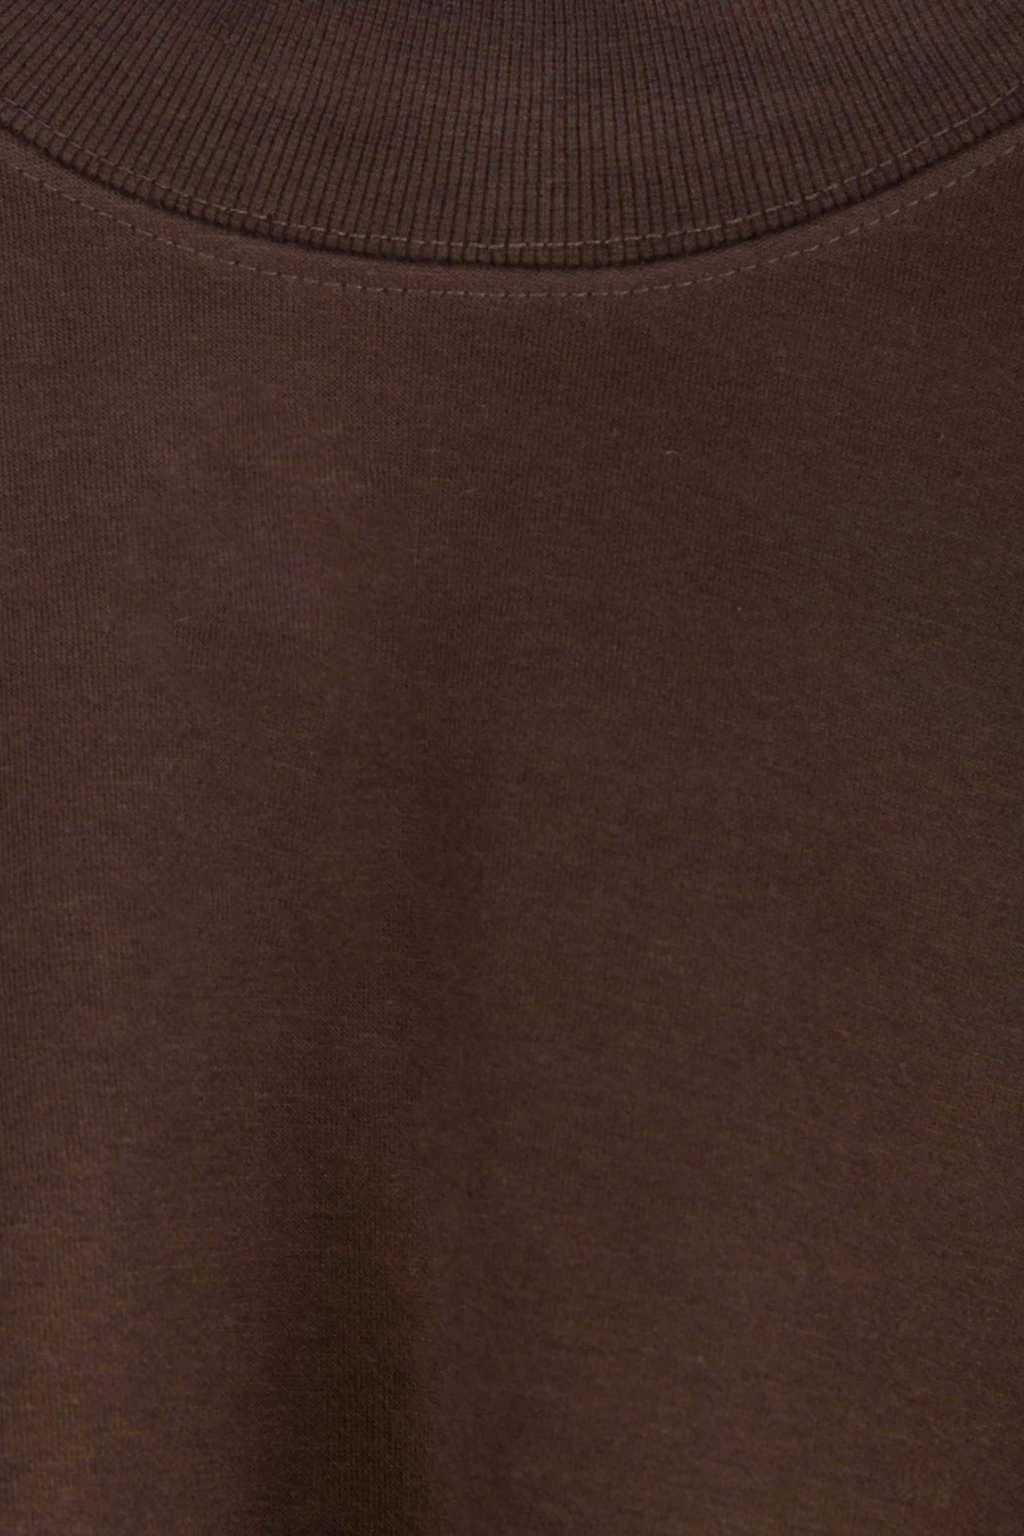 TShirt H446 Brown 6